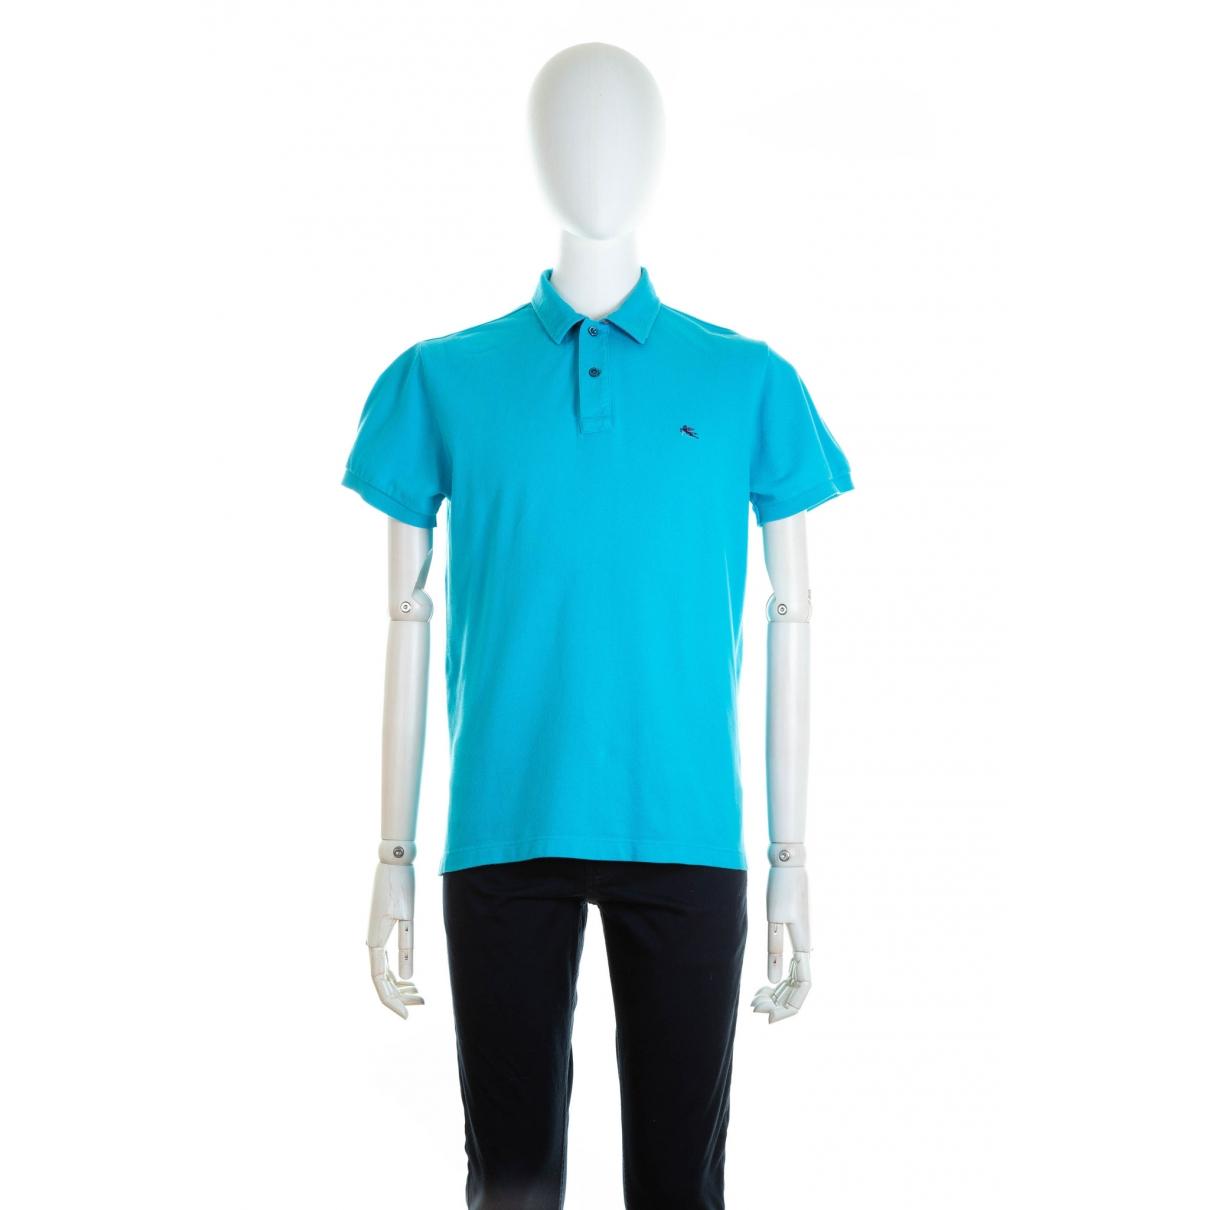 Etro - Tee shirts   pour homme en coton - turquoise